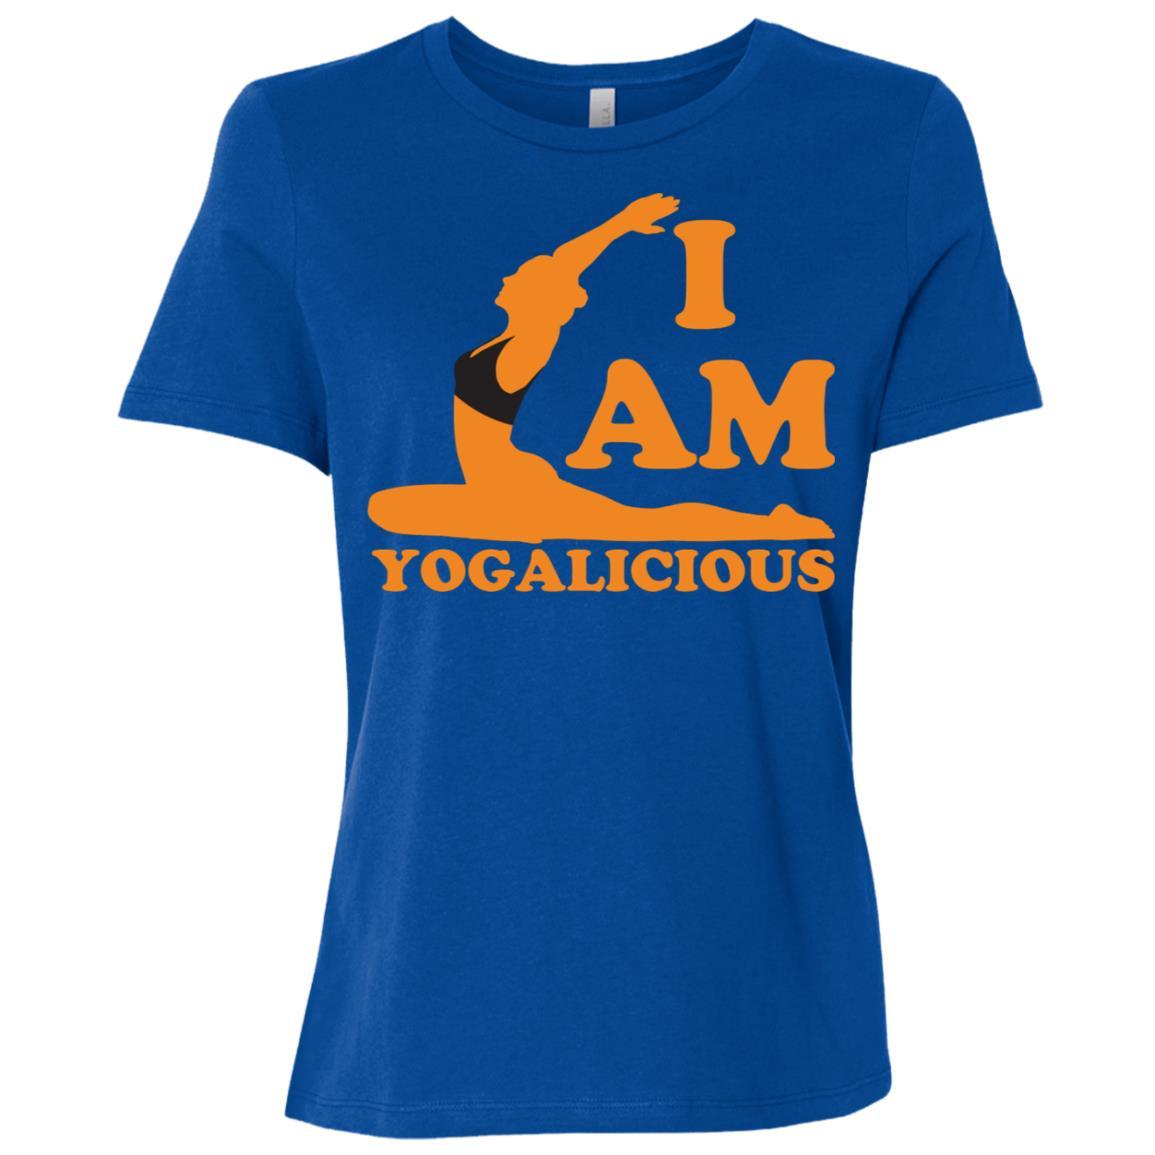 I am Yogalicious Yoga Gift for Women Women Short Sleeve T-Shirt